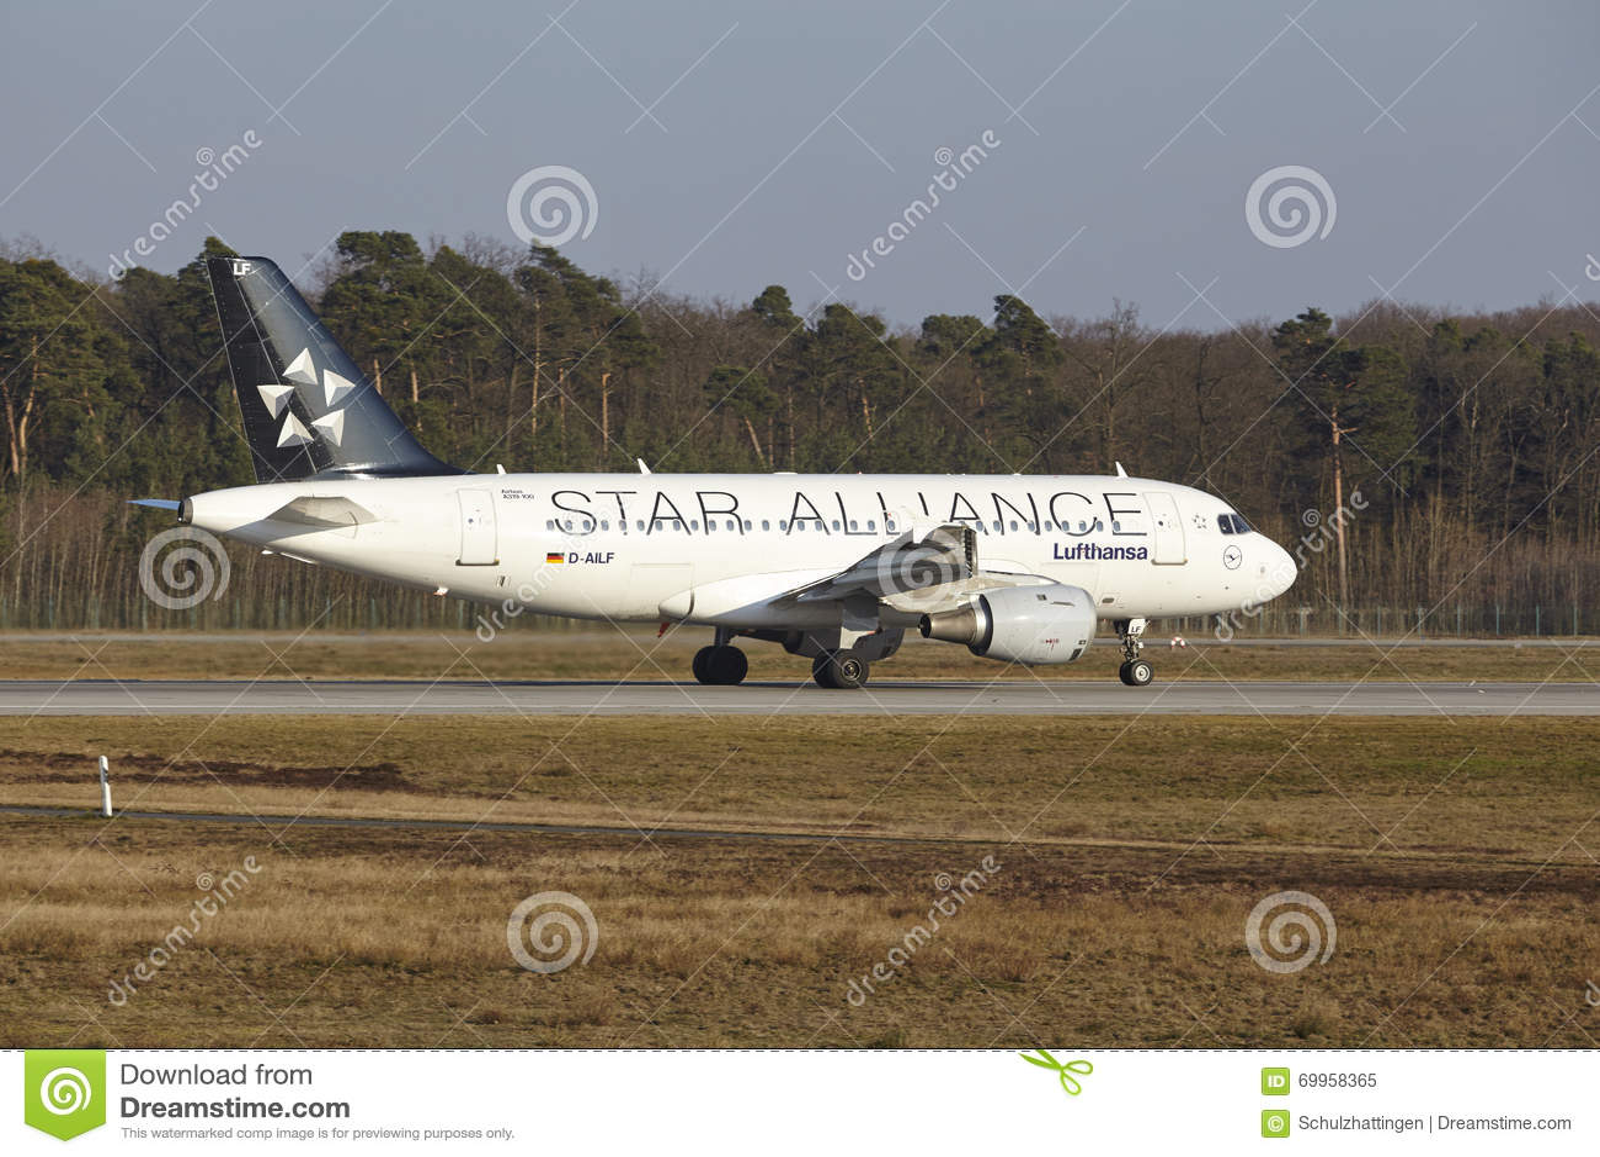 Airbus αερολιμένων †το «Lufthansa της Φρανκφούρτης διεθνές A319 απογειώνεται